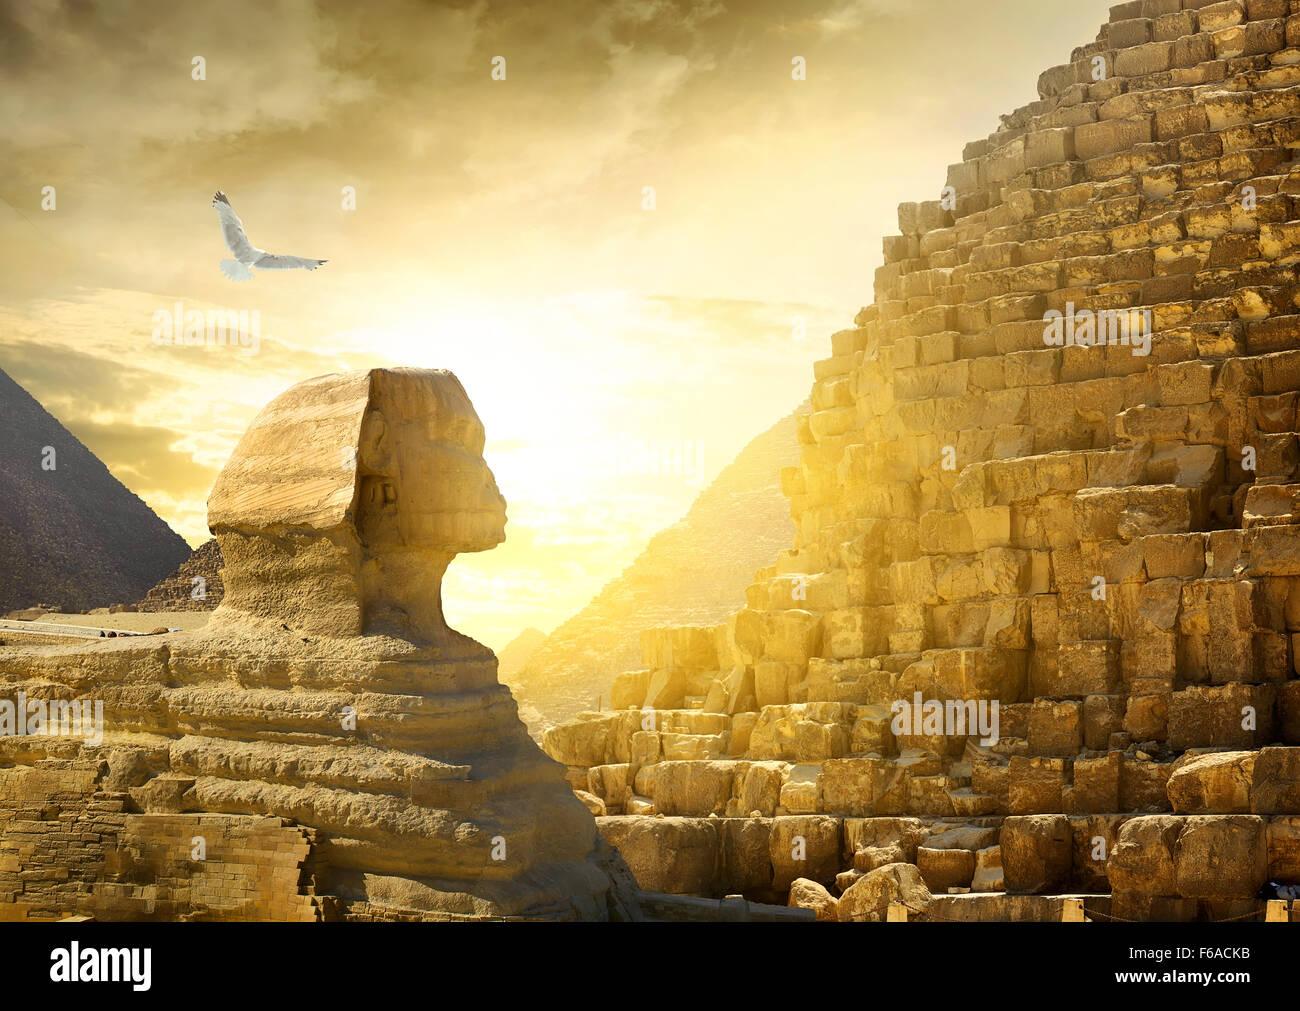 Große Sphinx und Pyramiden unter strahlender Sonne Stockbild